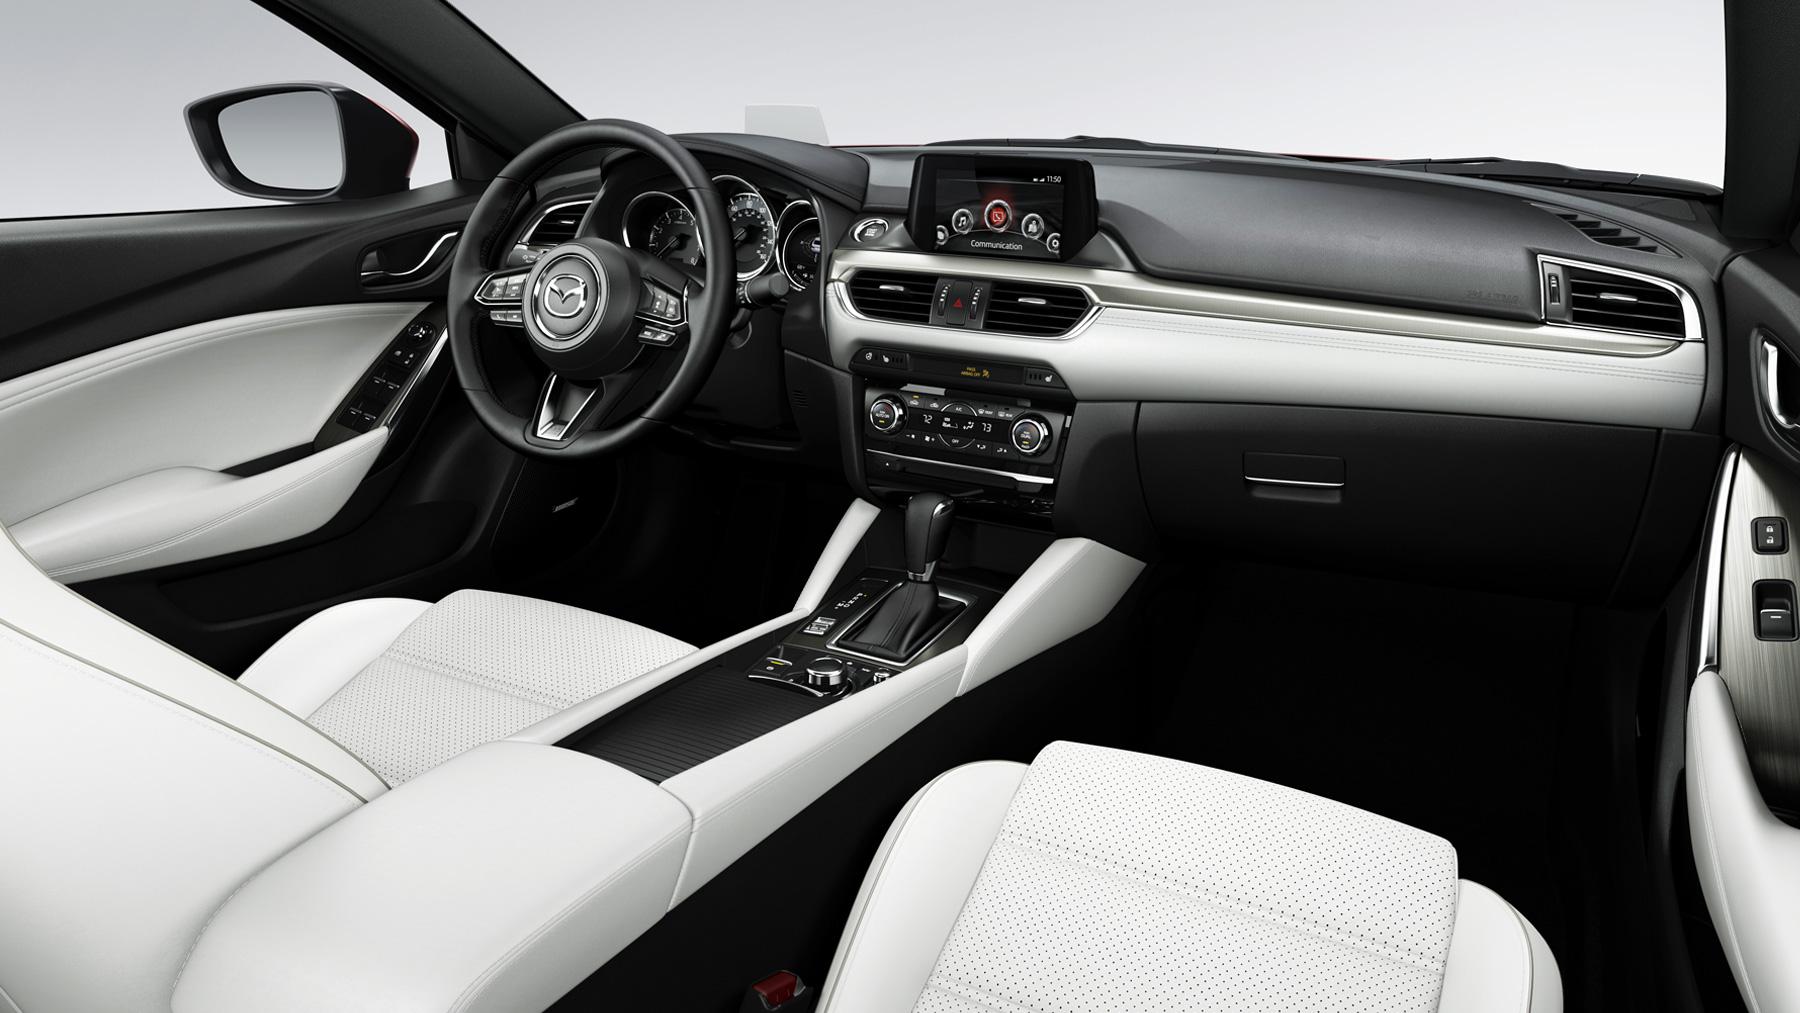 2017 Mazda 6 Sports Sedan Mid Size Cars Mazda Usa